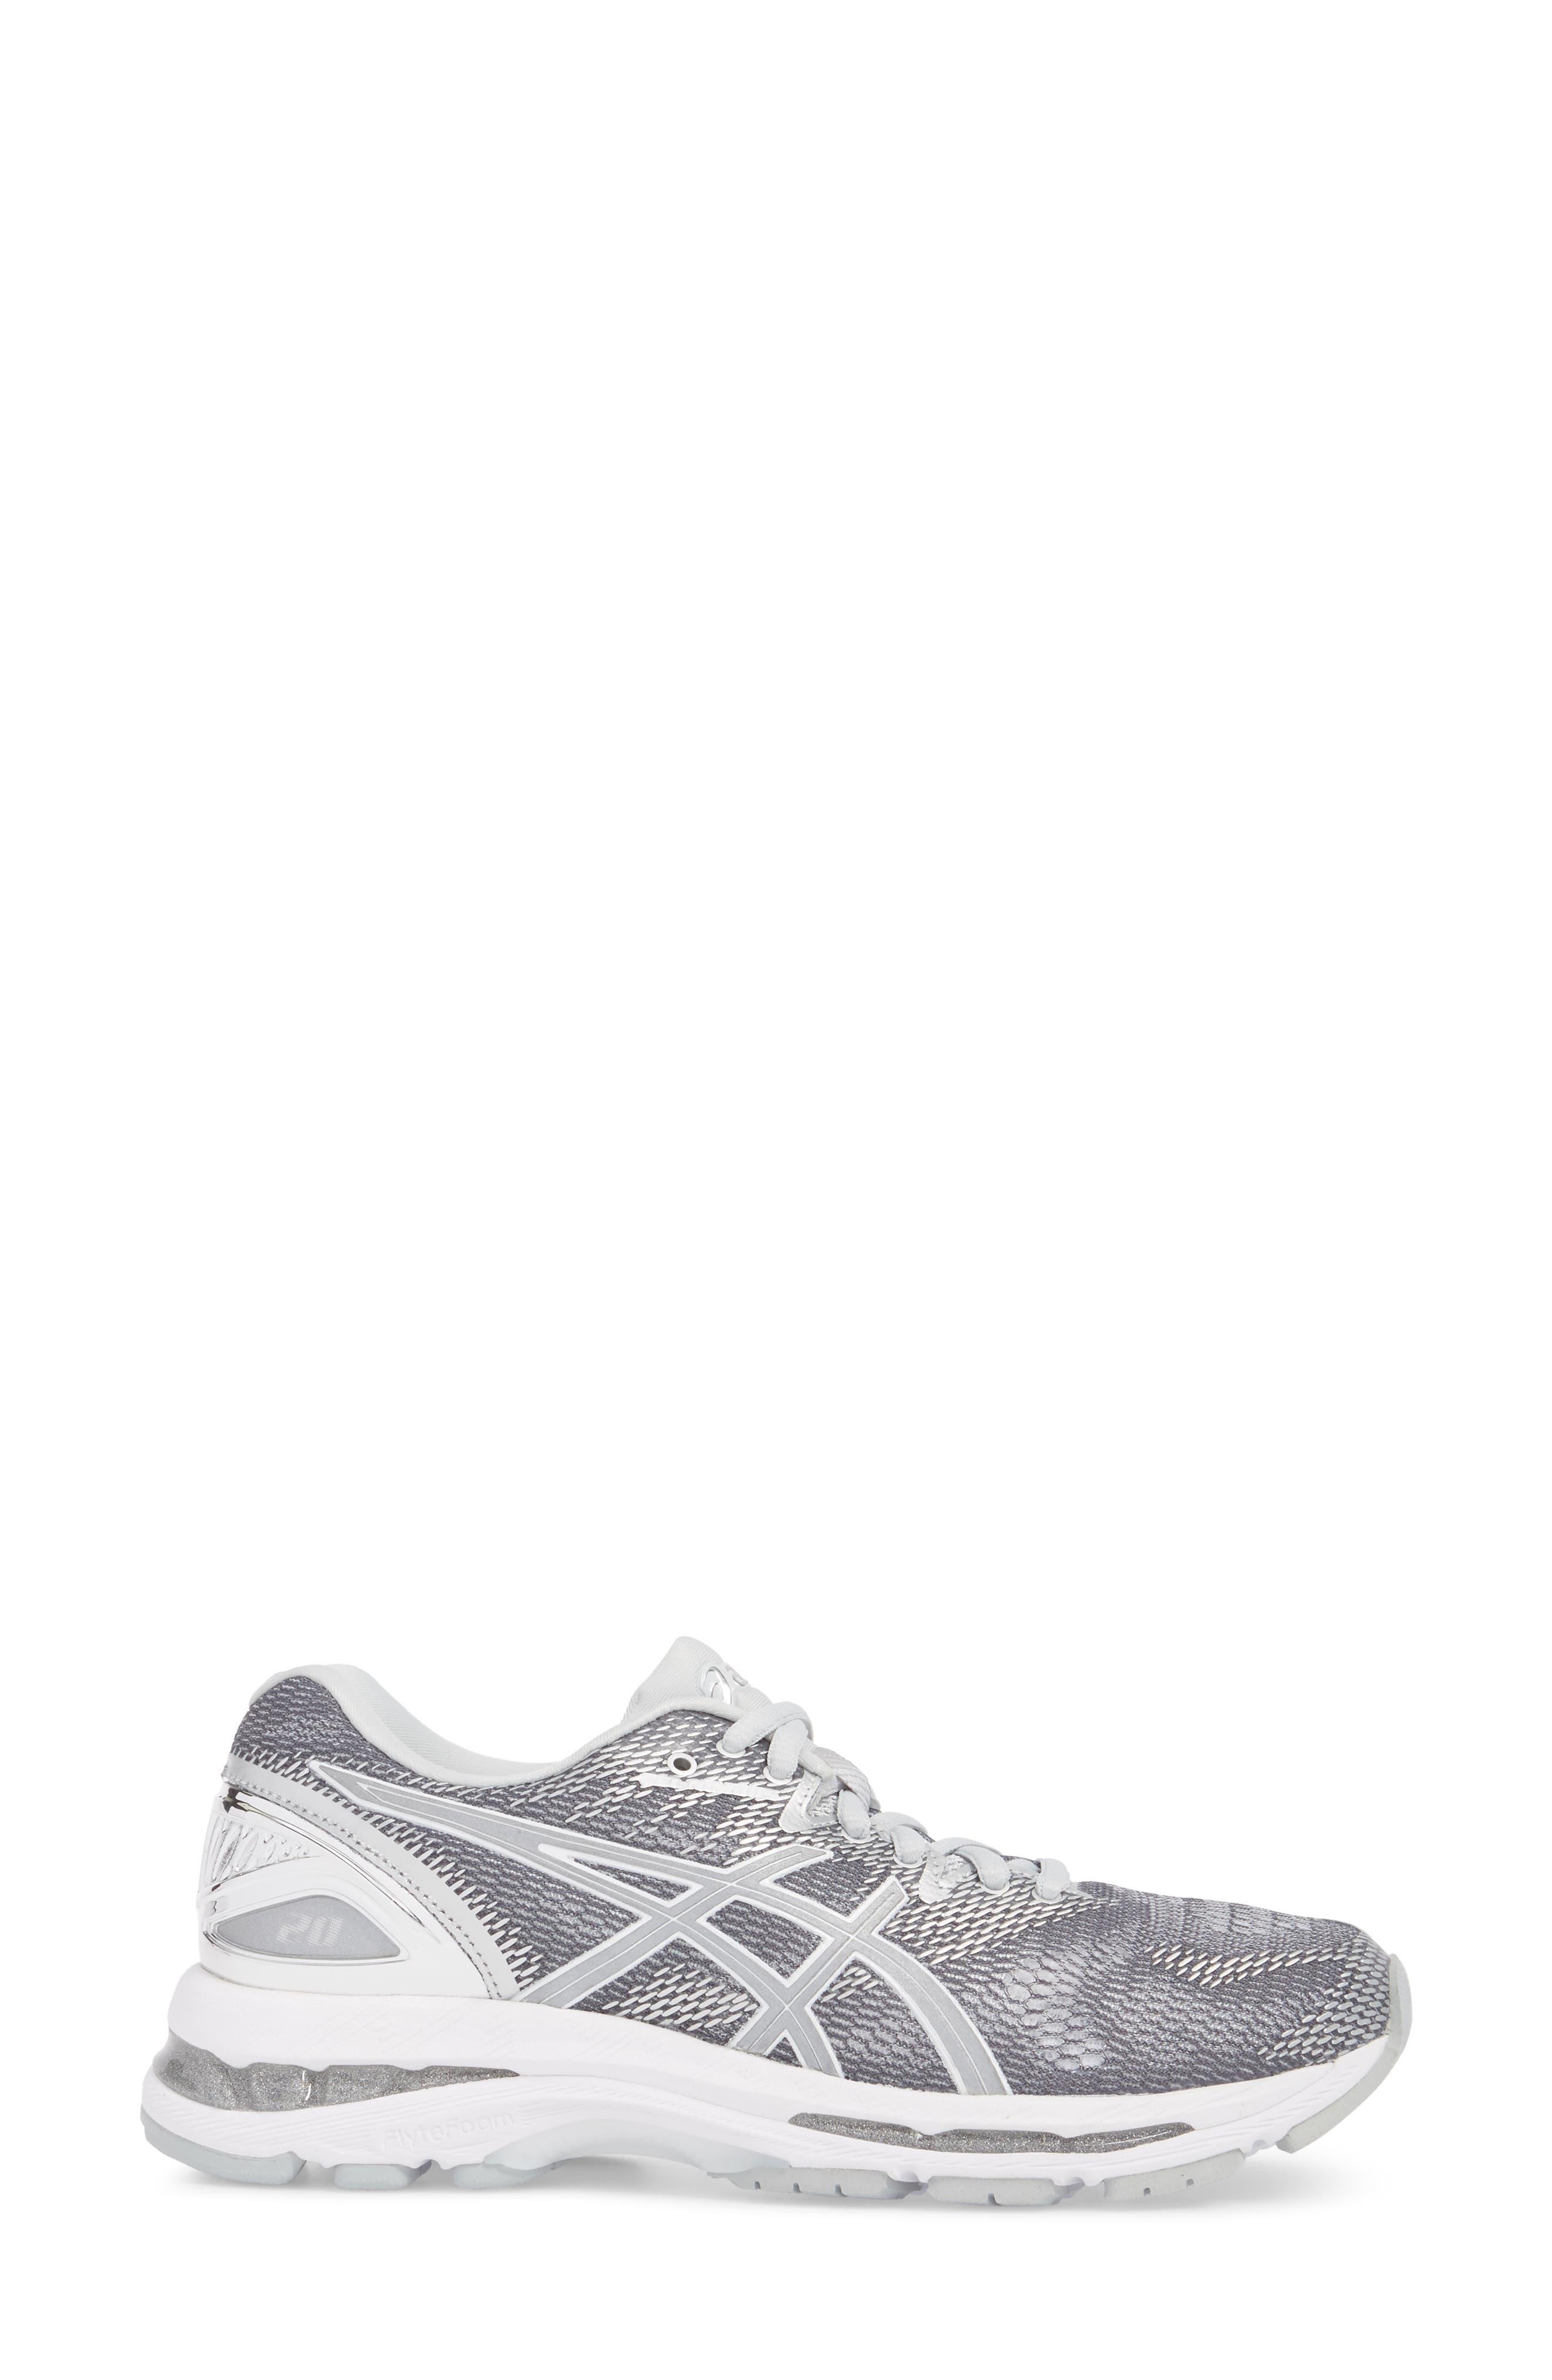 GEL-Nimbus 20 Platinum Running Shoe,                             Alternate thumbnail 3, color,                             097